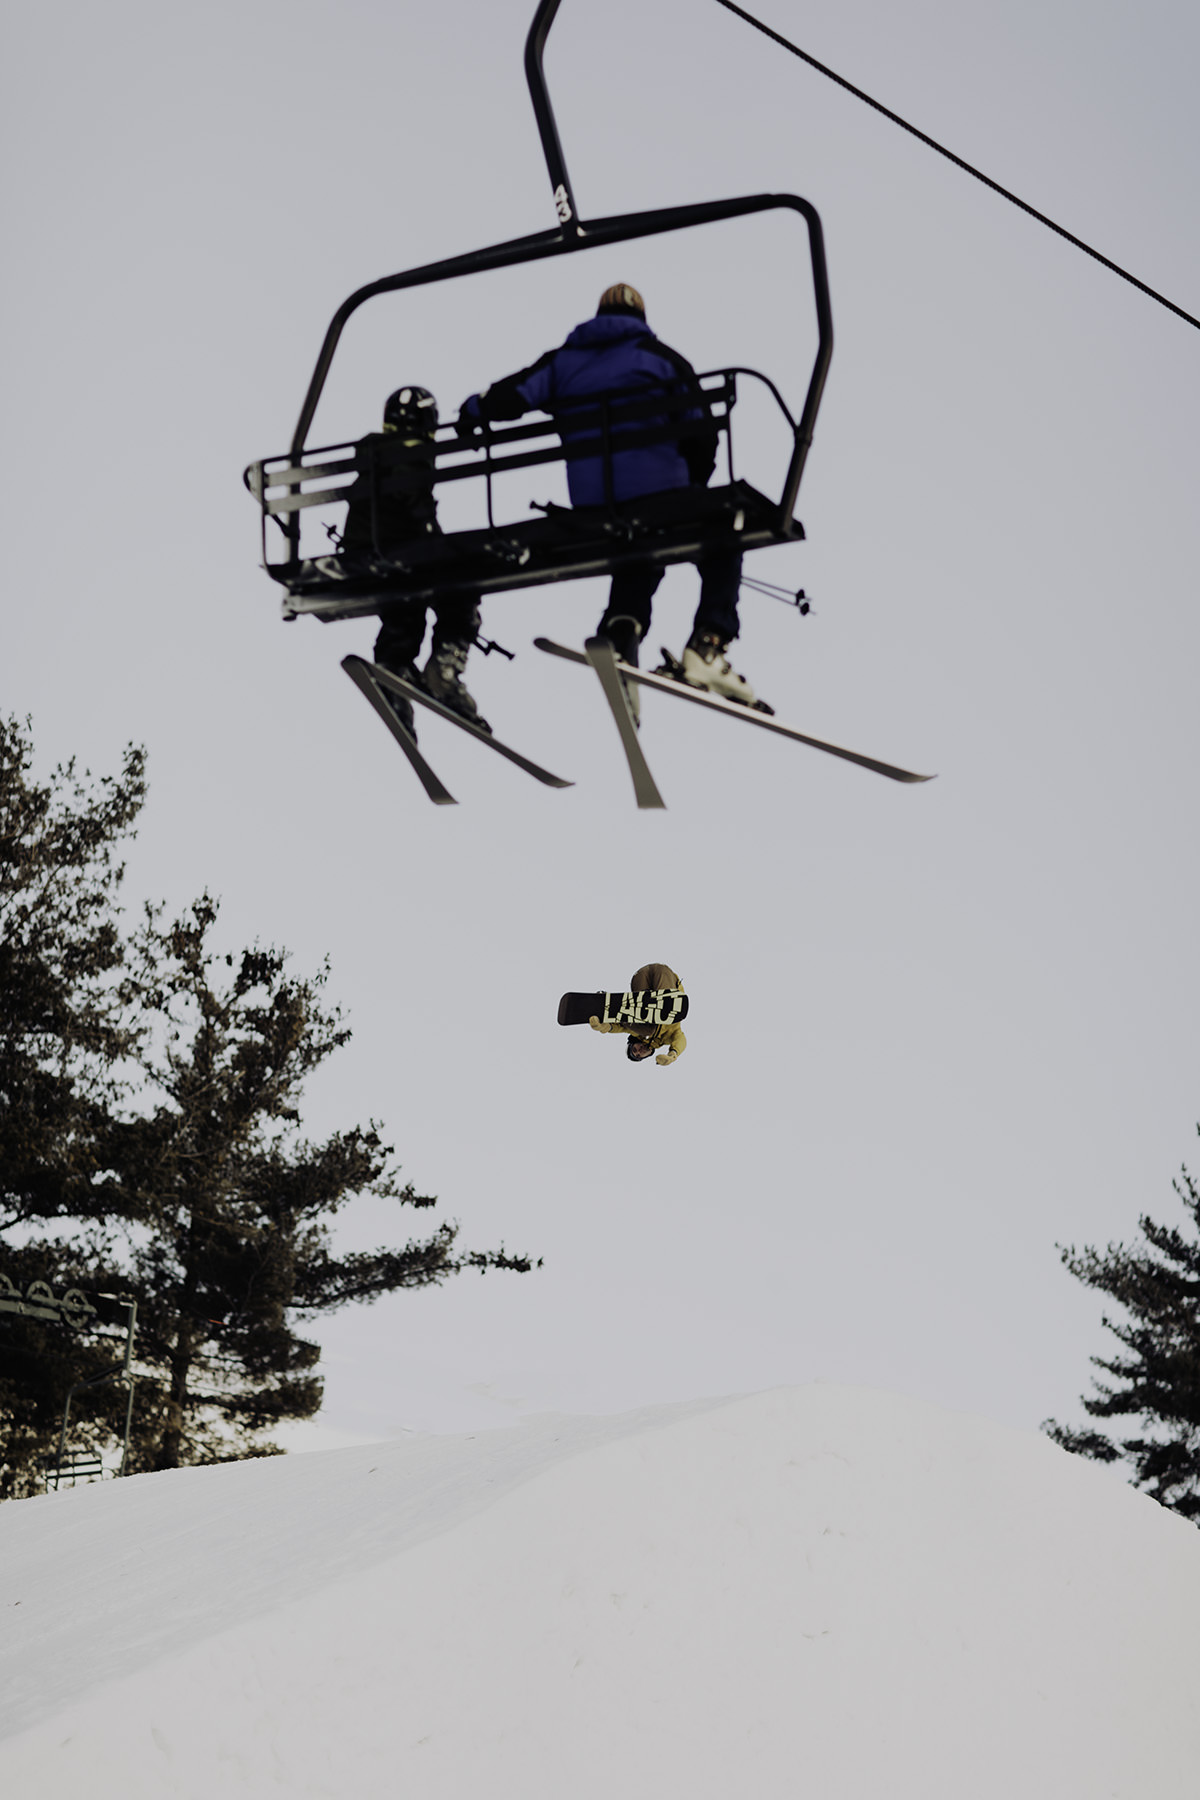 Adventure-Elopement-Photographer-Colorado-snowboarder-jumping-1